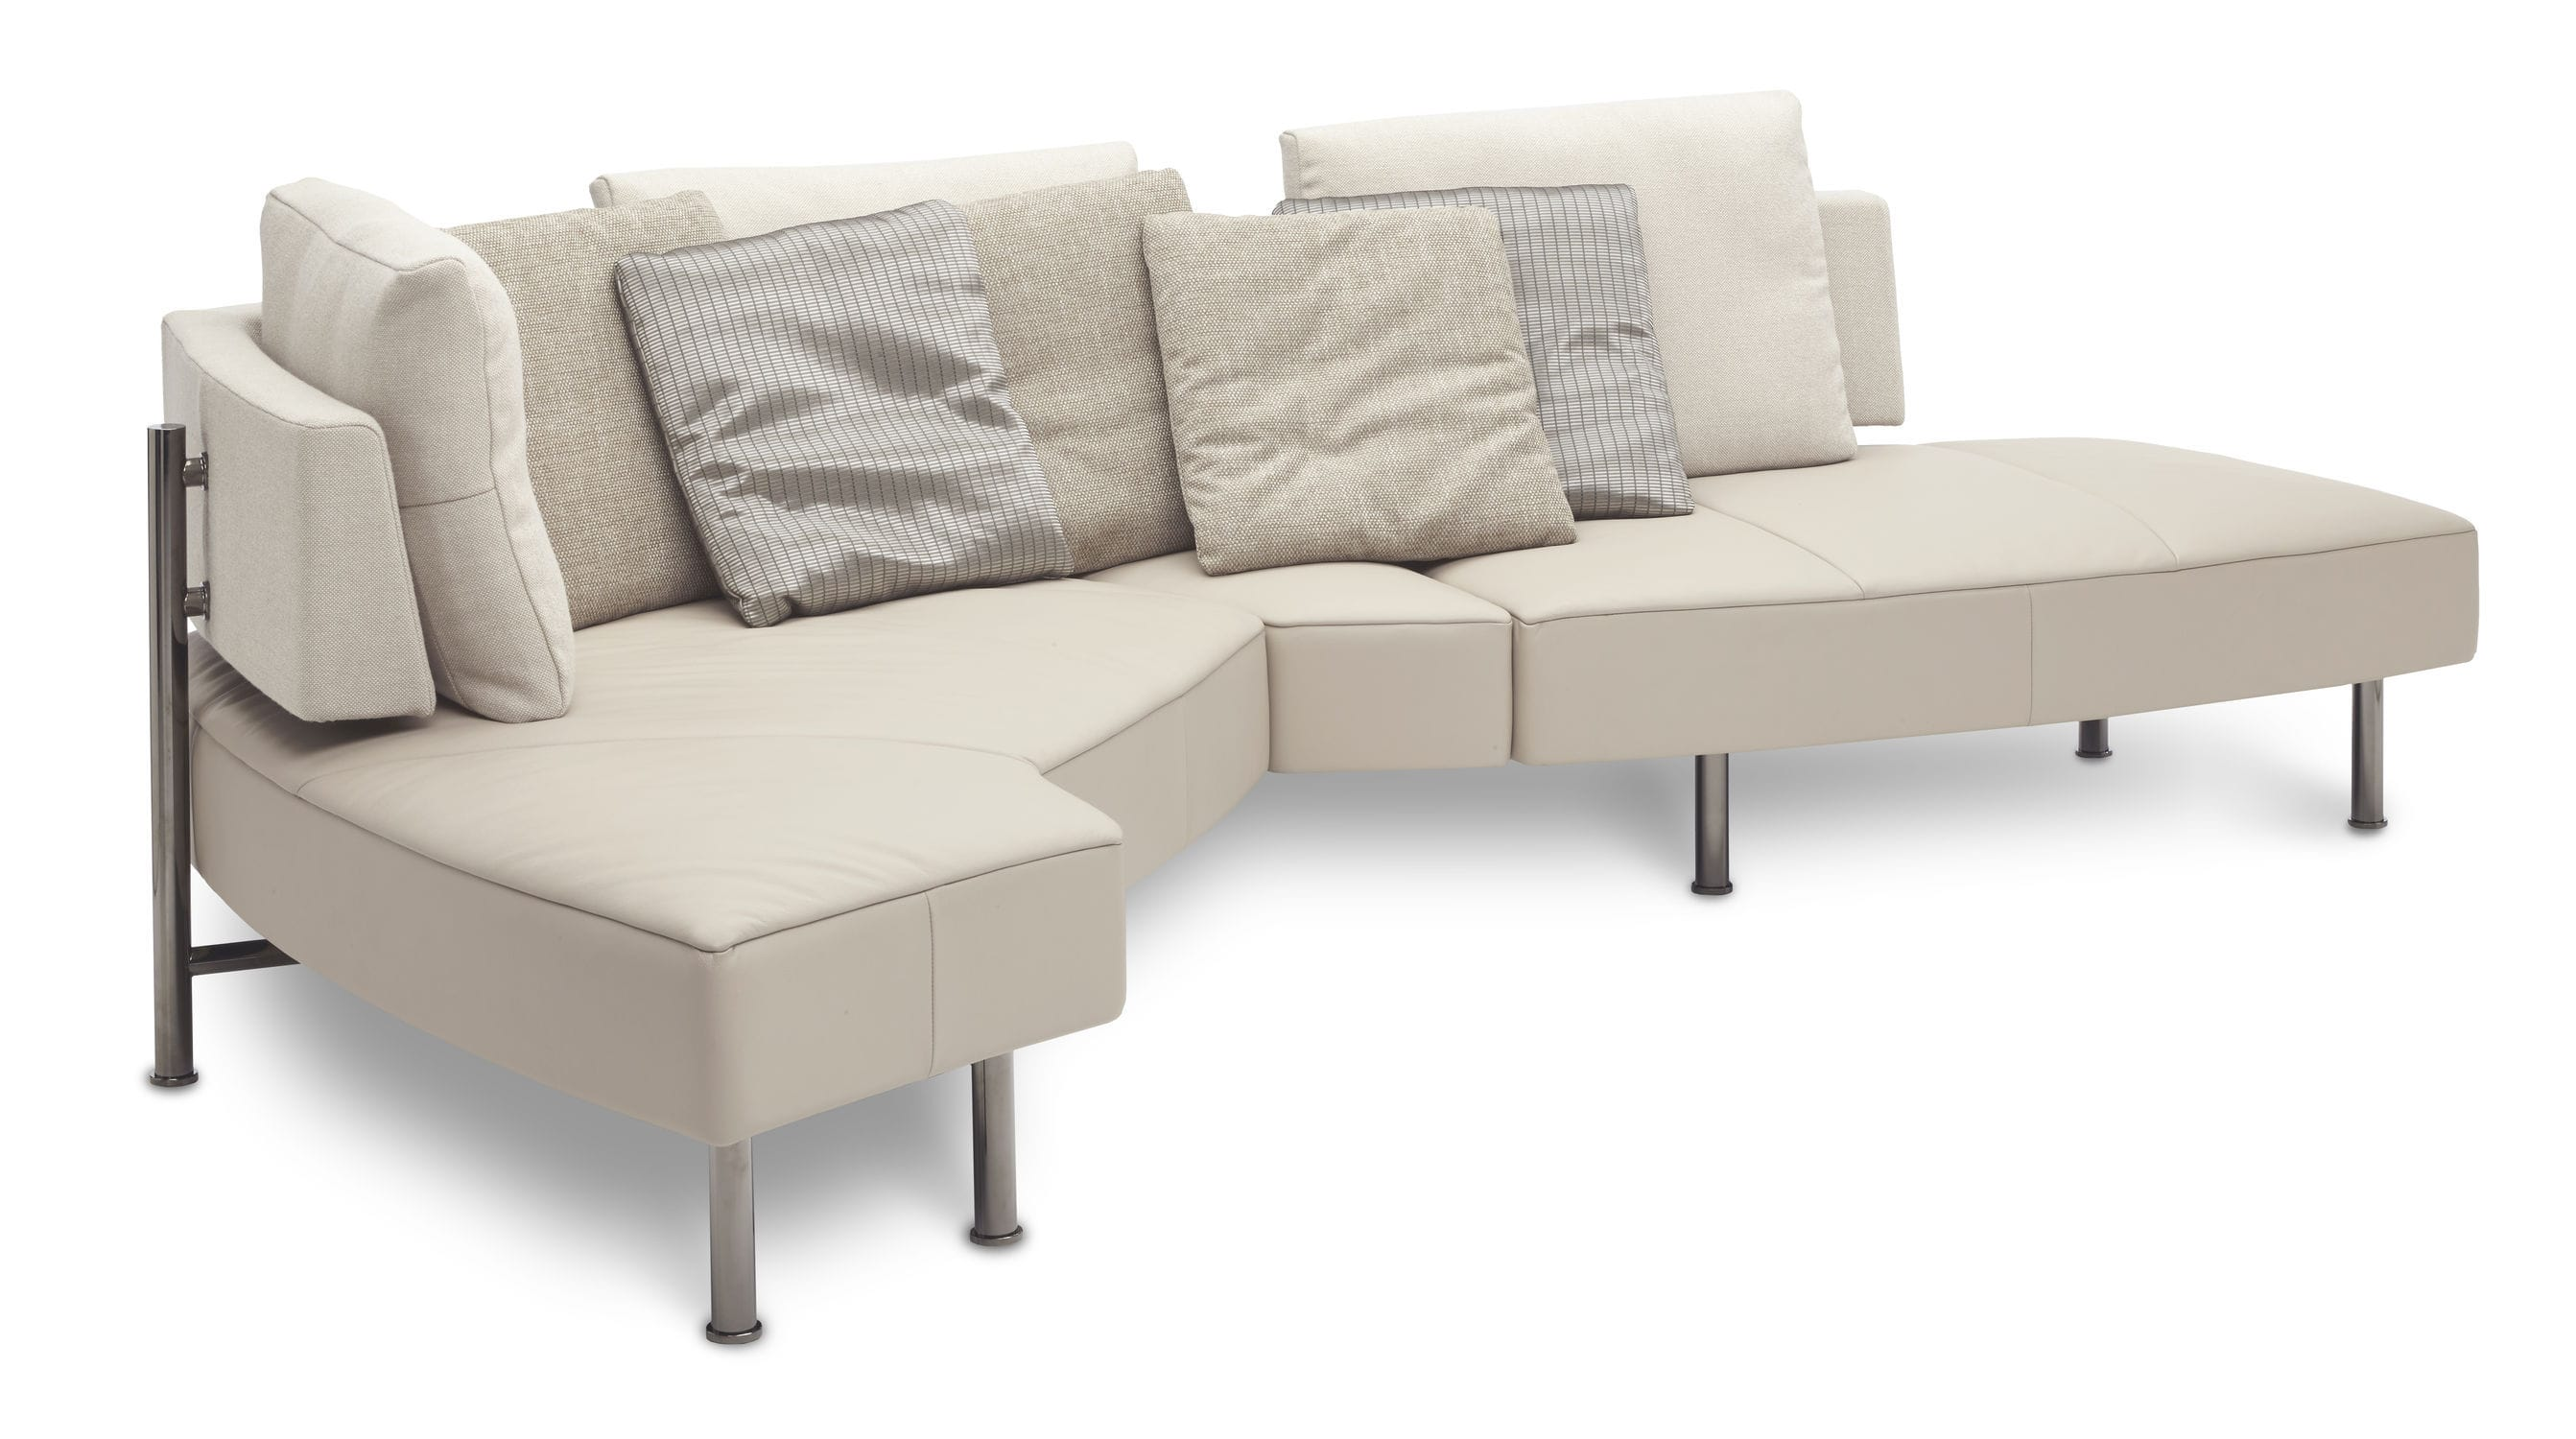 modular sofa  contemporary  leather  fabric  wing open base by  -  modular sofa  contemporary  leather  fabric wing open base by hugode ruiter jori